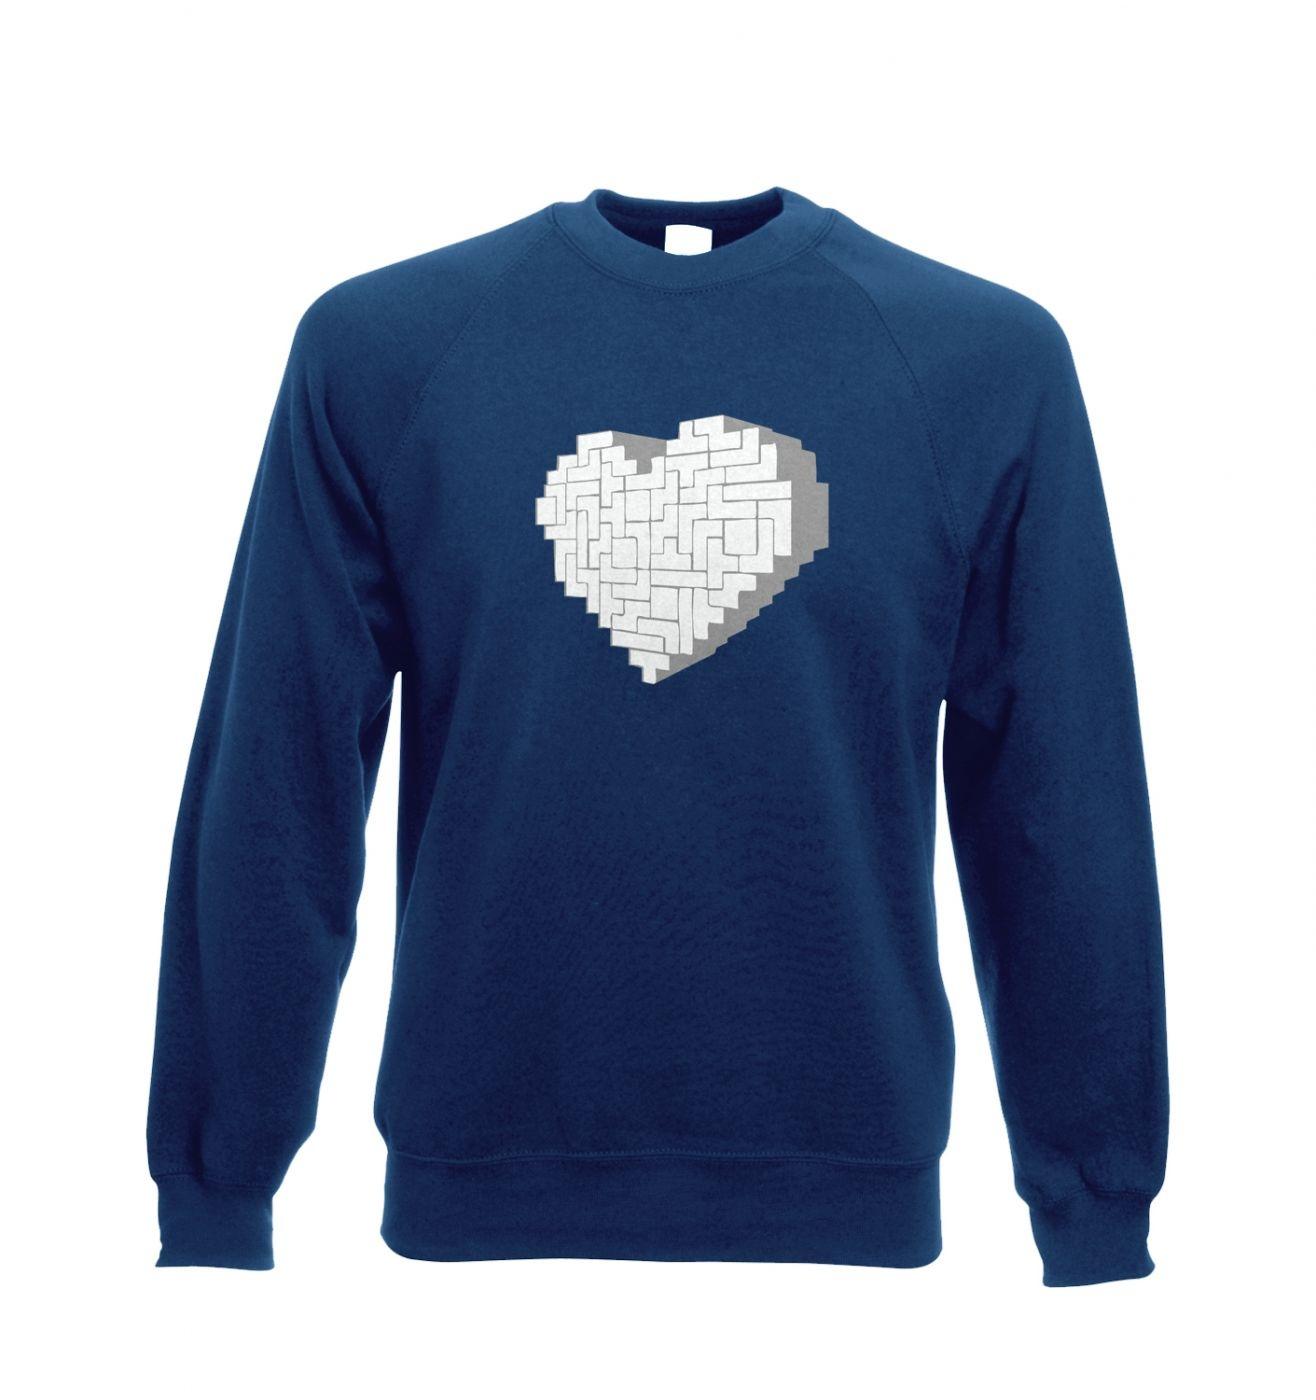 Shaped Brick Heart crewneck sweatshirt